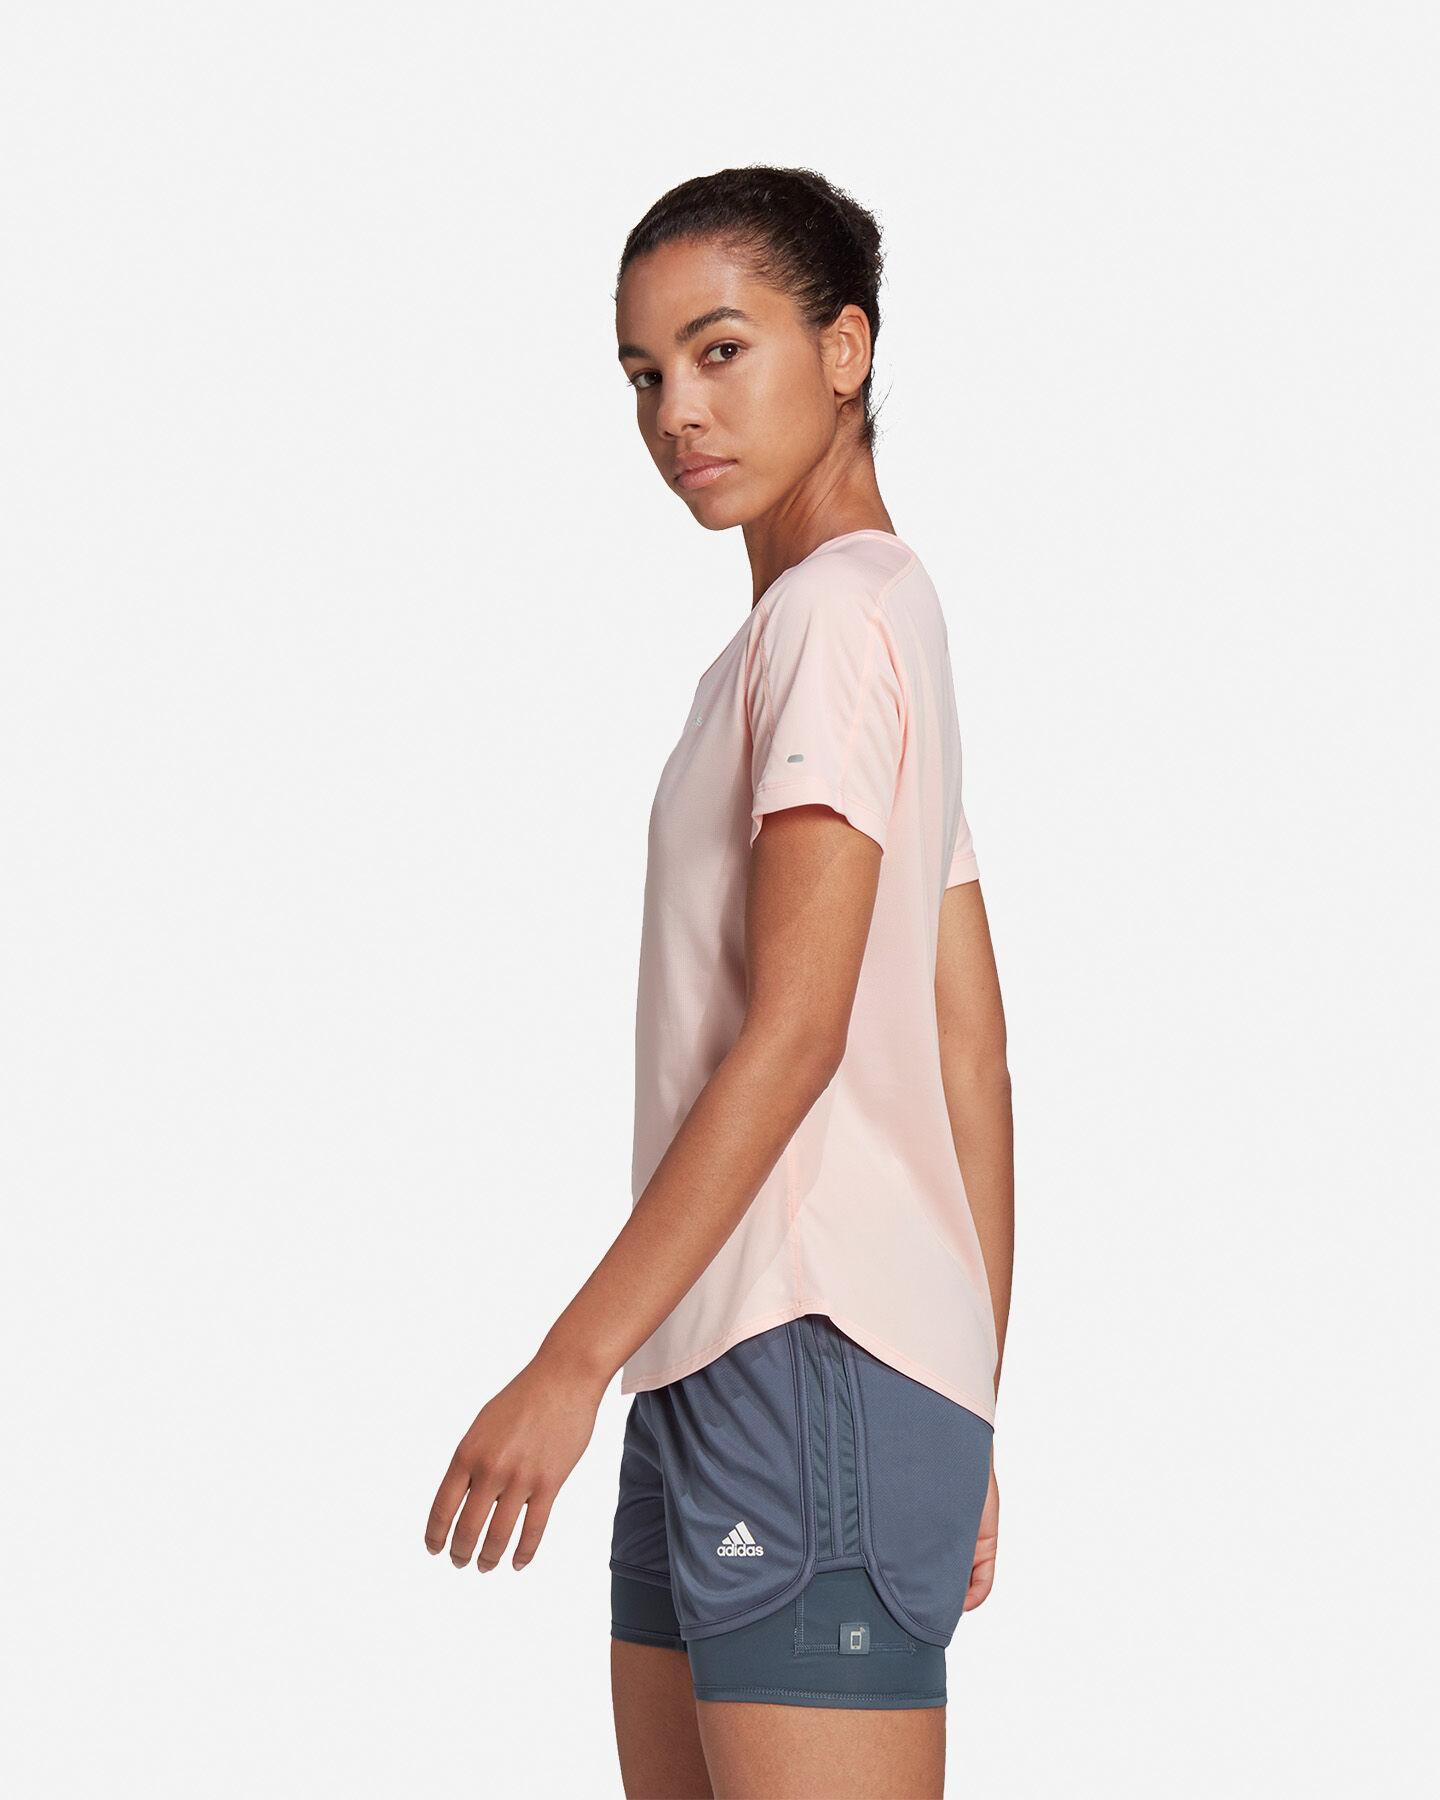 T-Shirt running ADIDAS RUN IT 3 STRIPES W S5210001 scatto 3